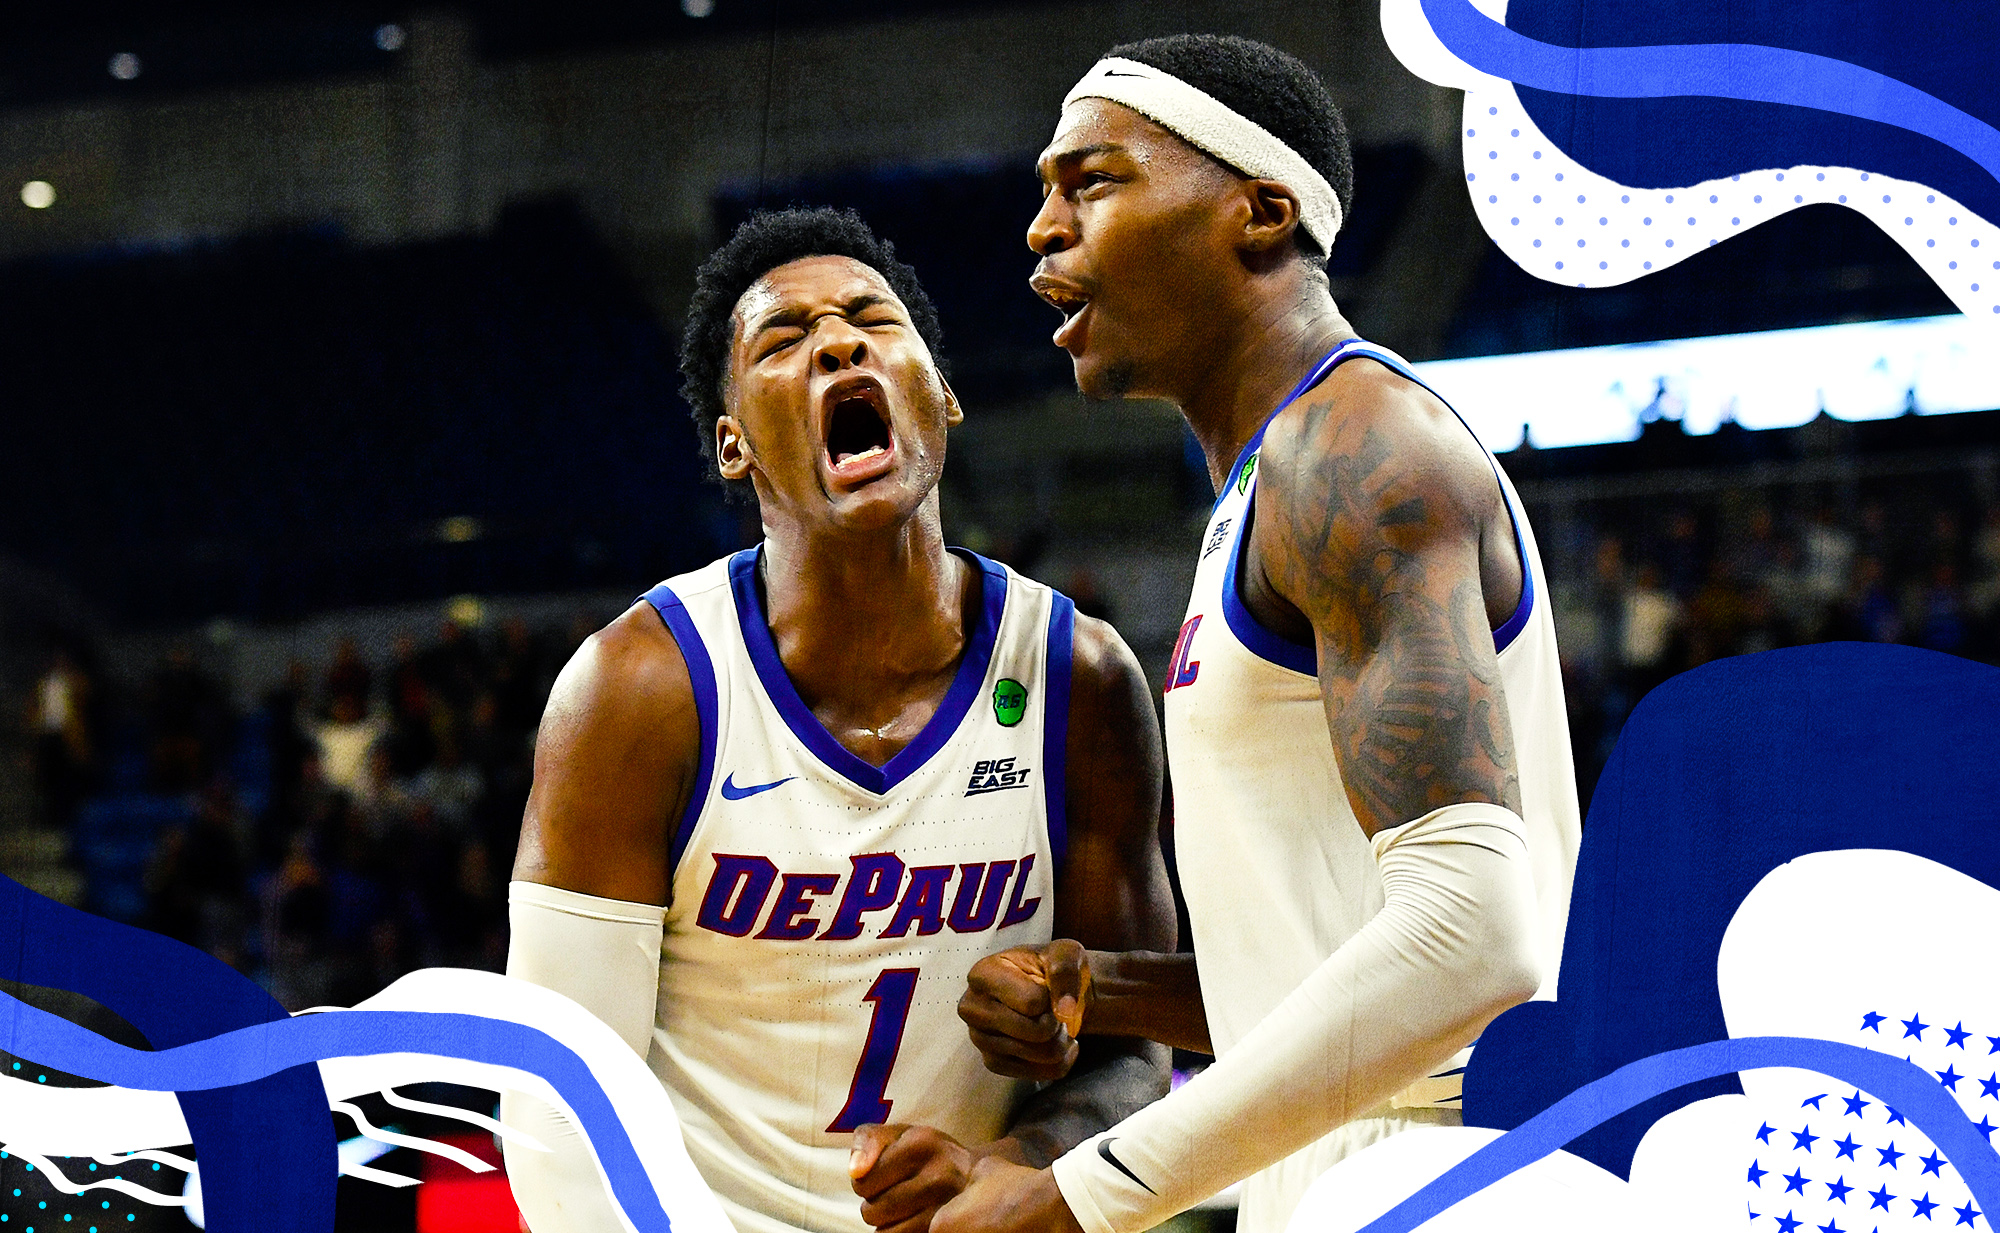 DePaul basketball's dream resurgence is finally real